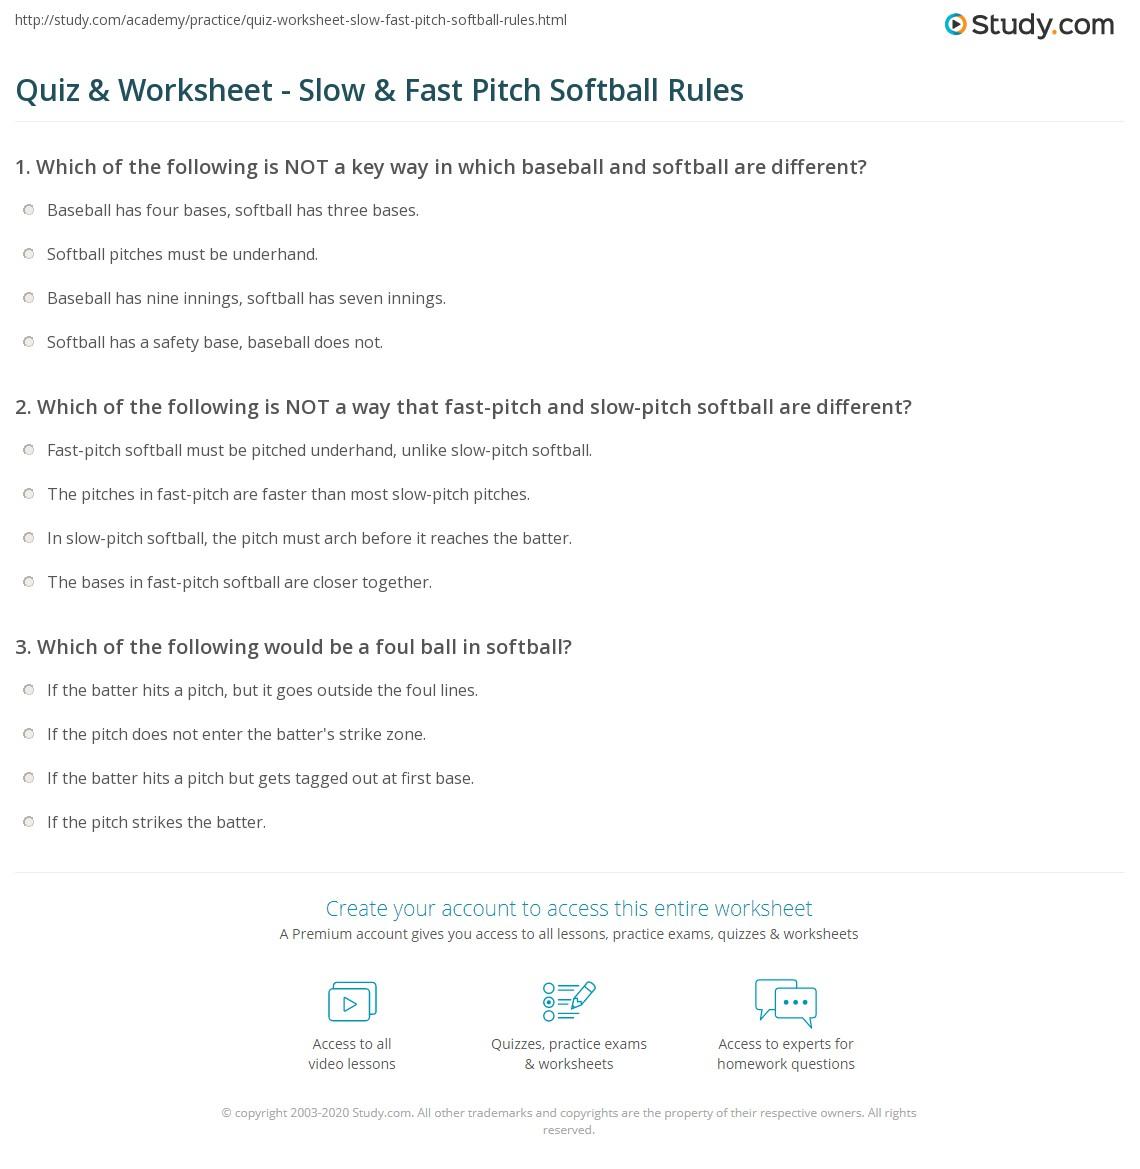 Quiz Worksheet Slow Fast Pitch Softball Rules Study